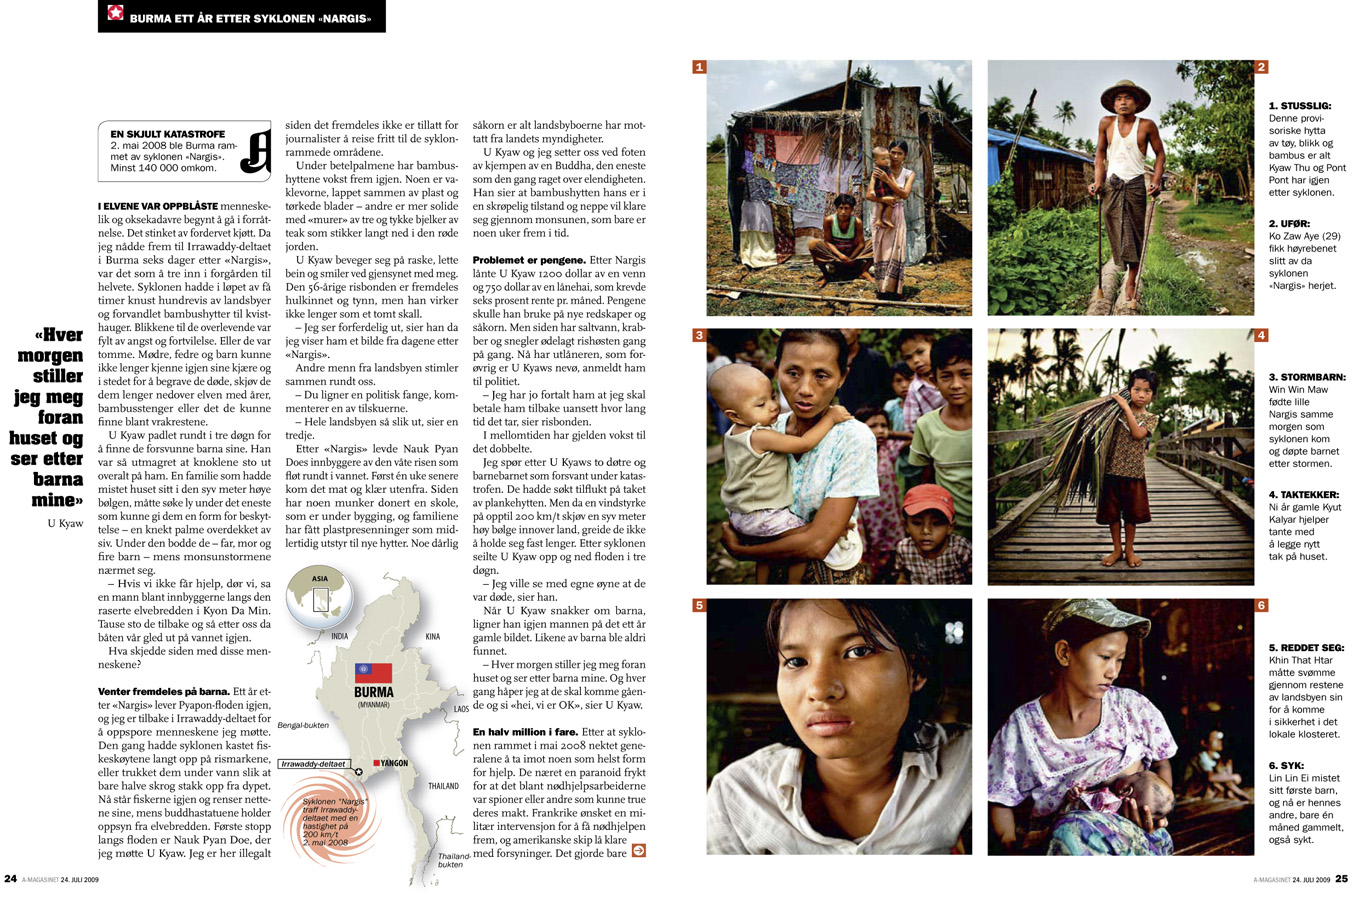 AFTENPOSTEN_Burma_One_Year-4.jpg